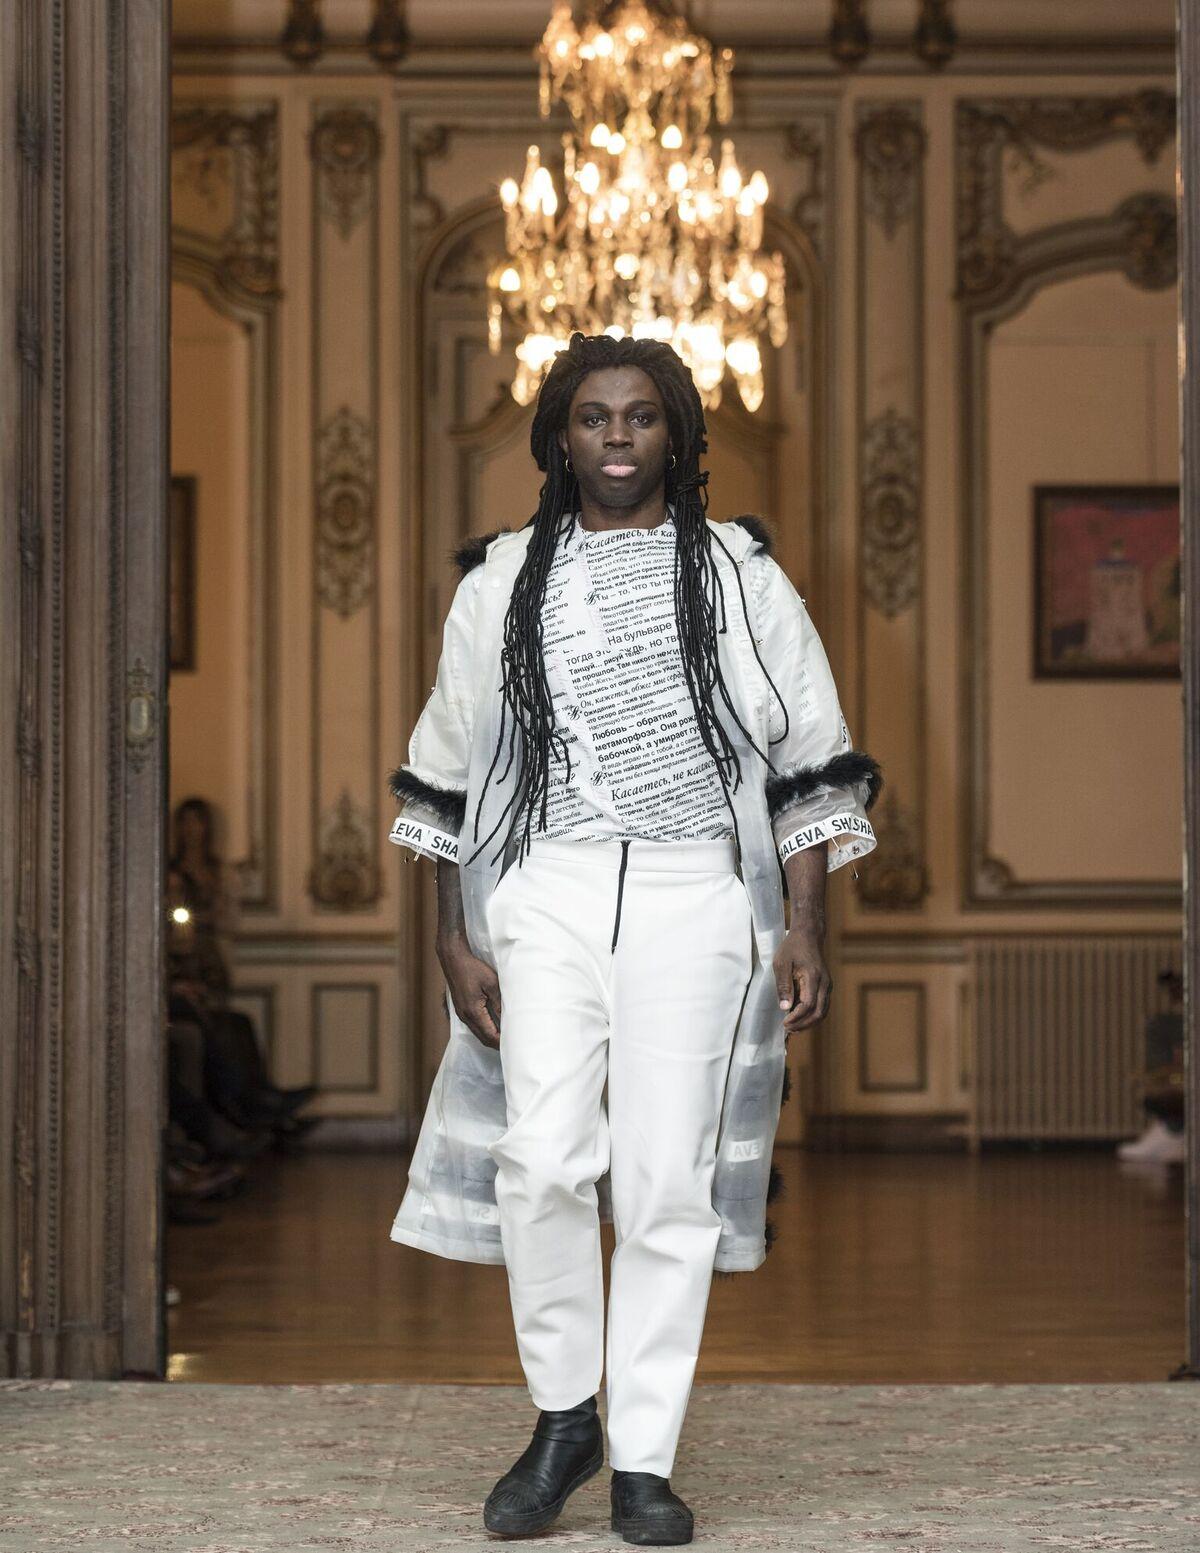 Shaleva freedom ss20 during paris fashion week (9)